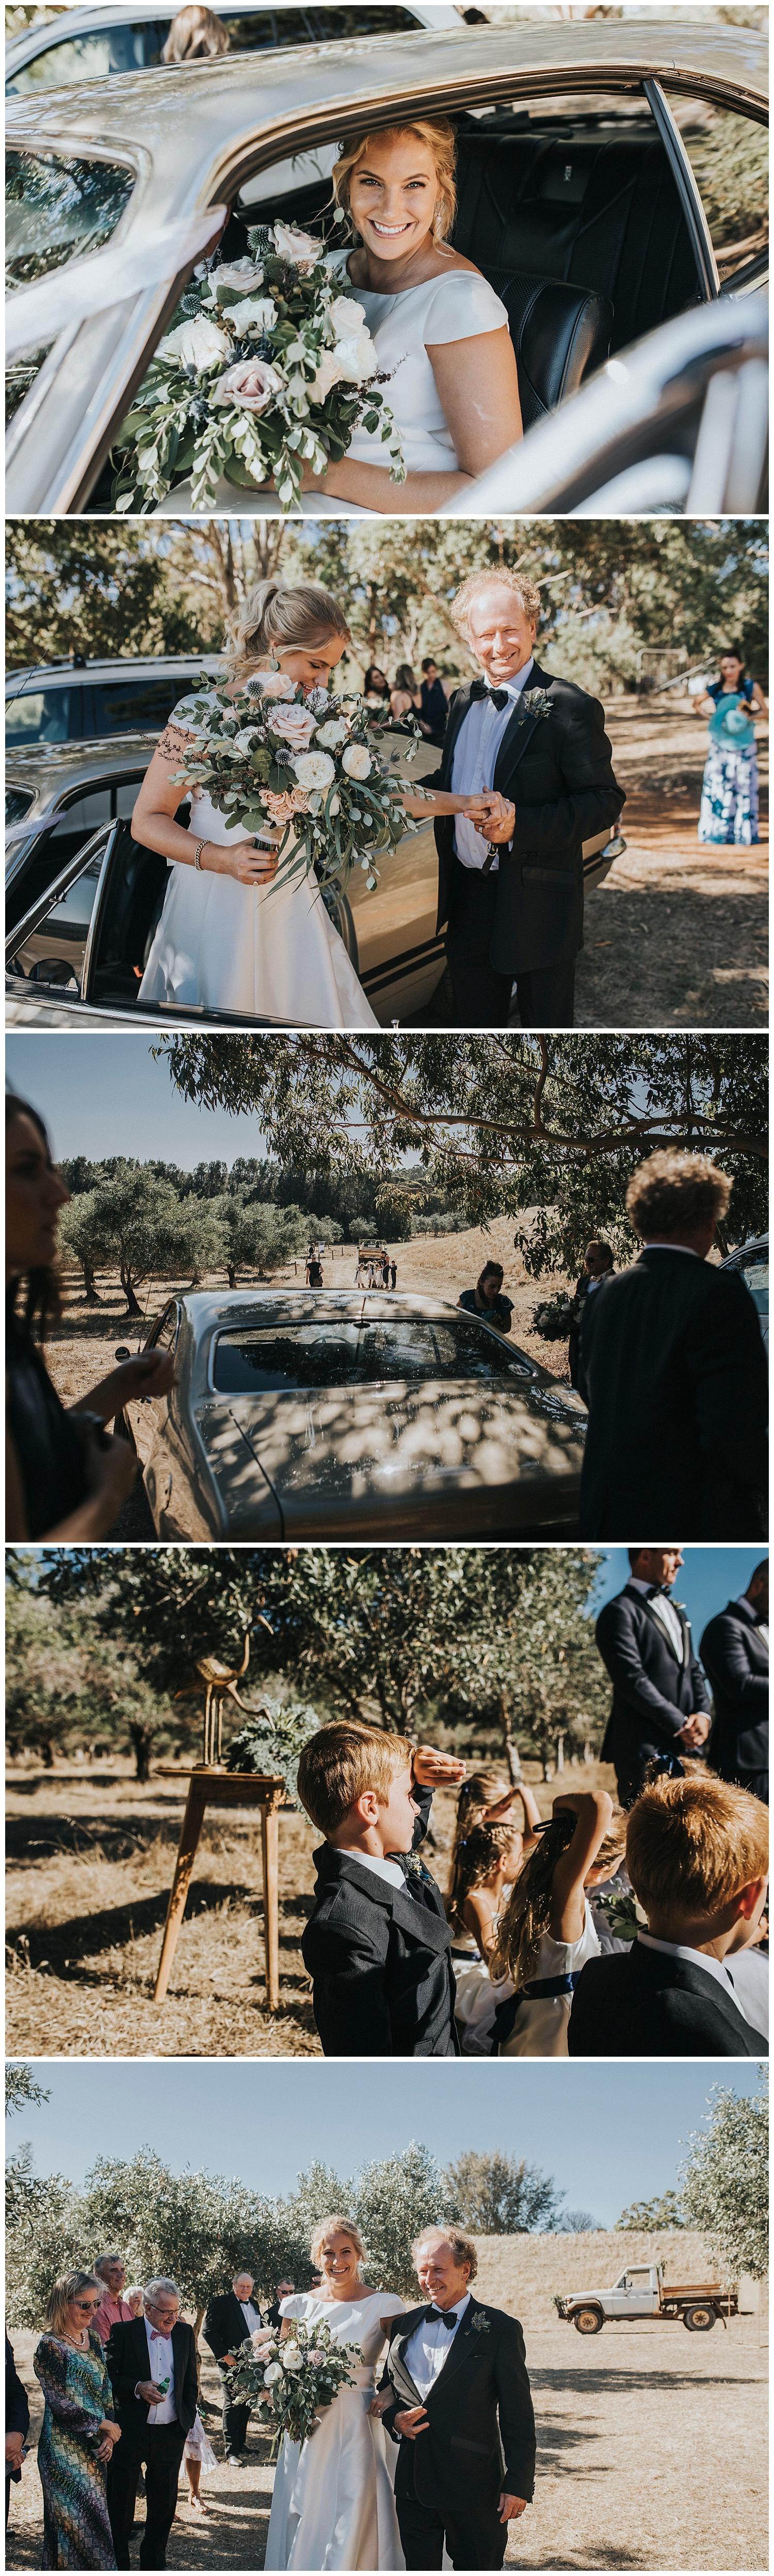 olio_bello_wedding_keeper_creative_012.JPG